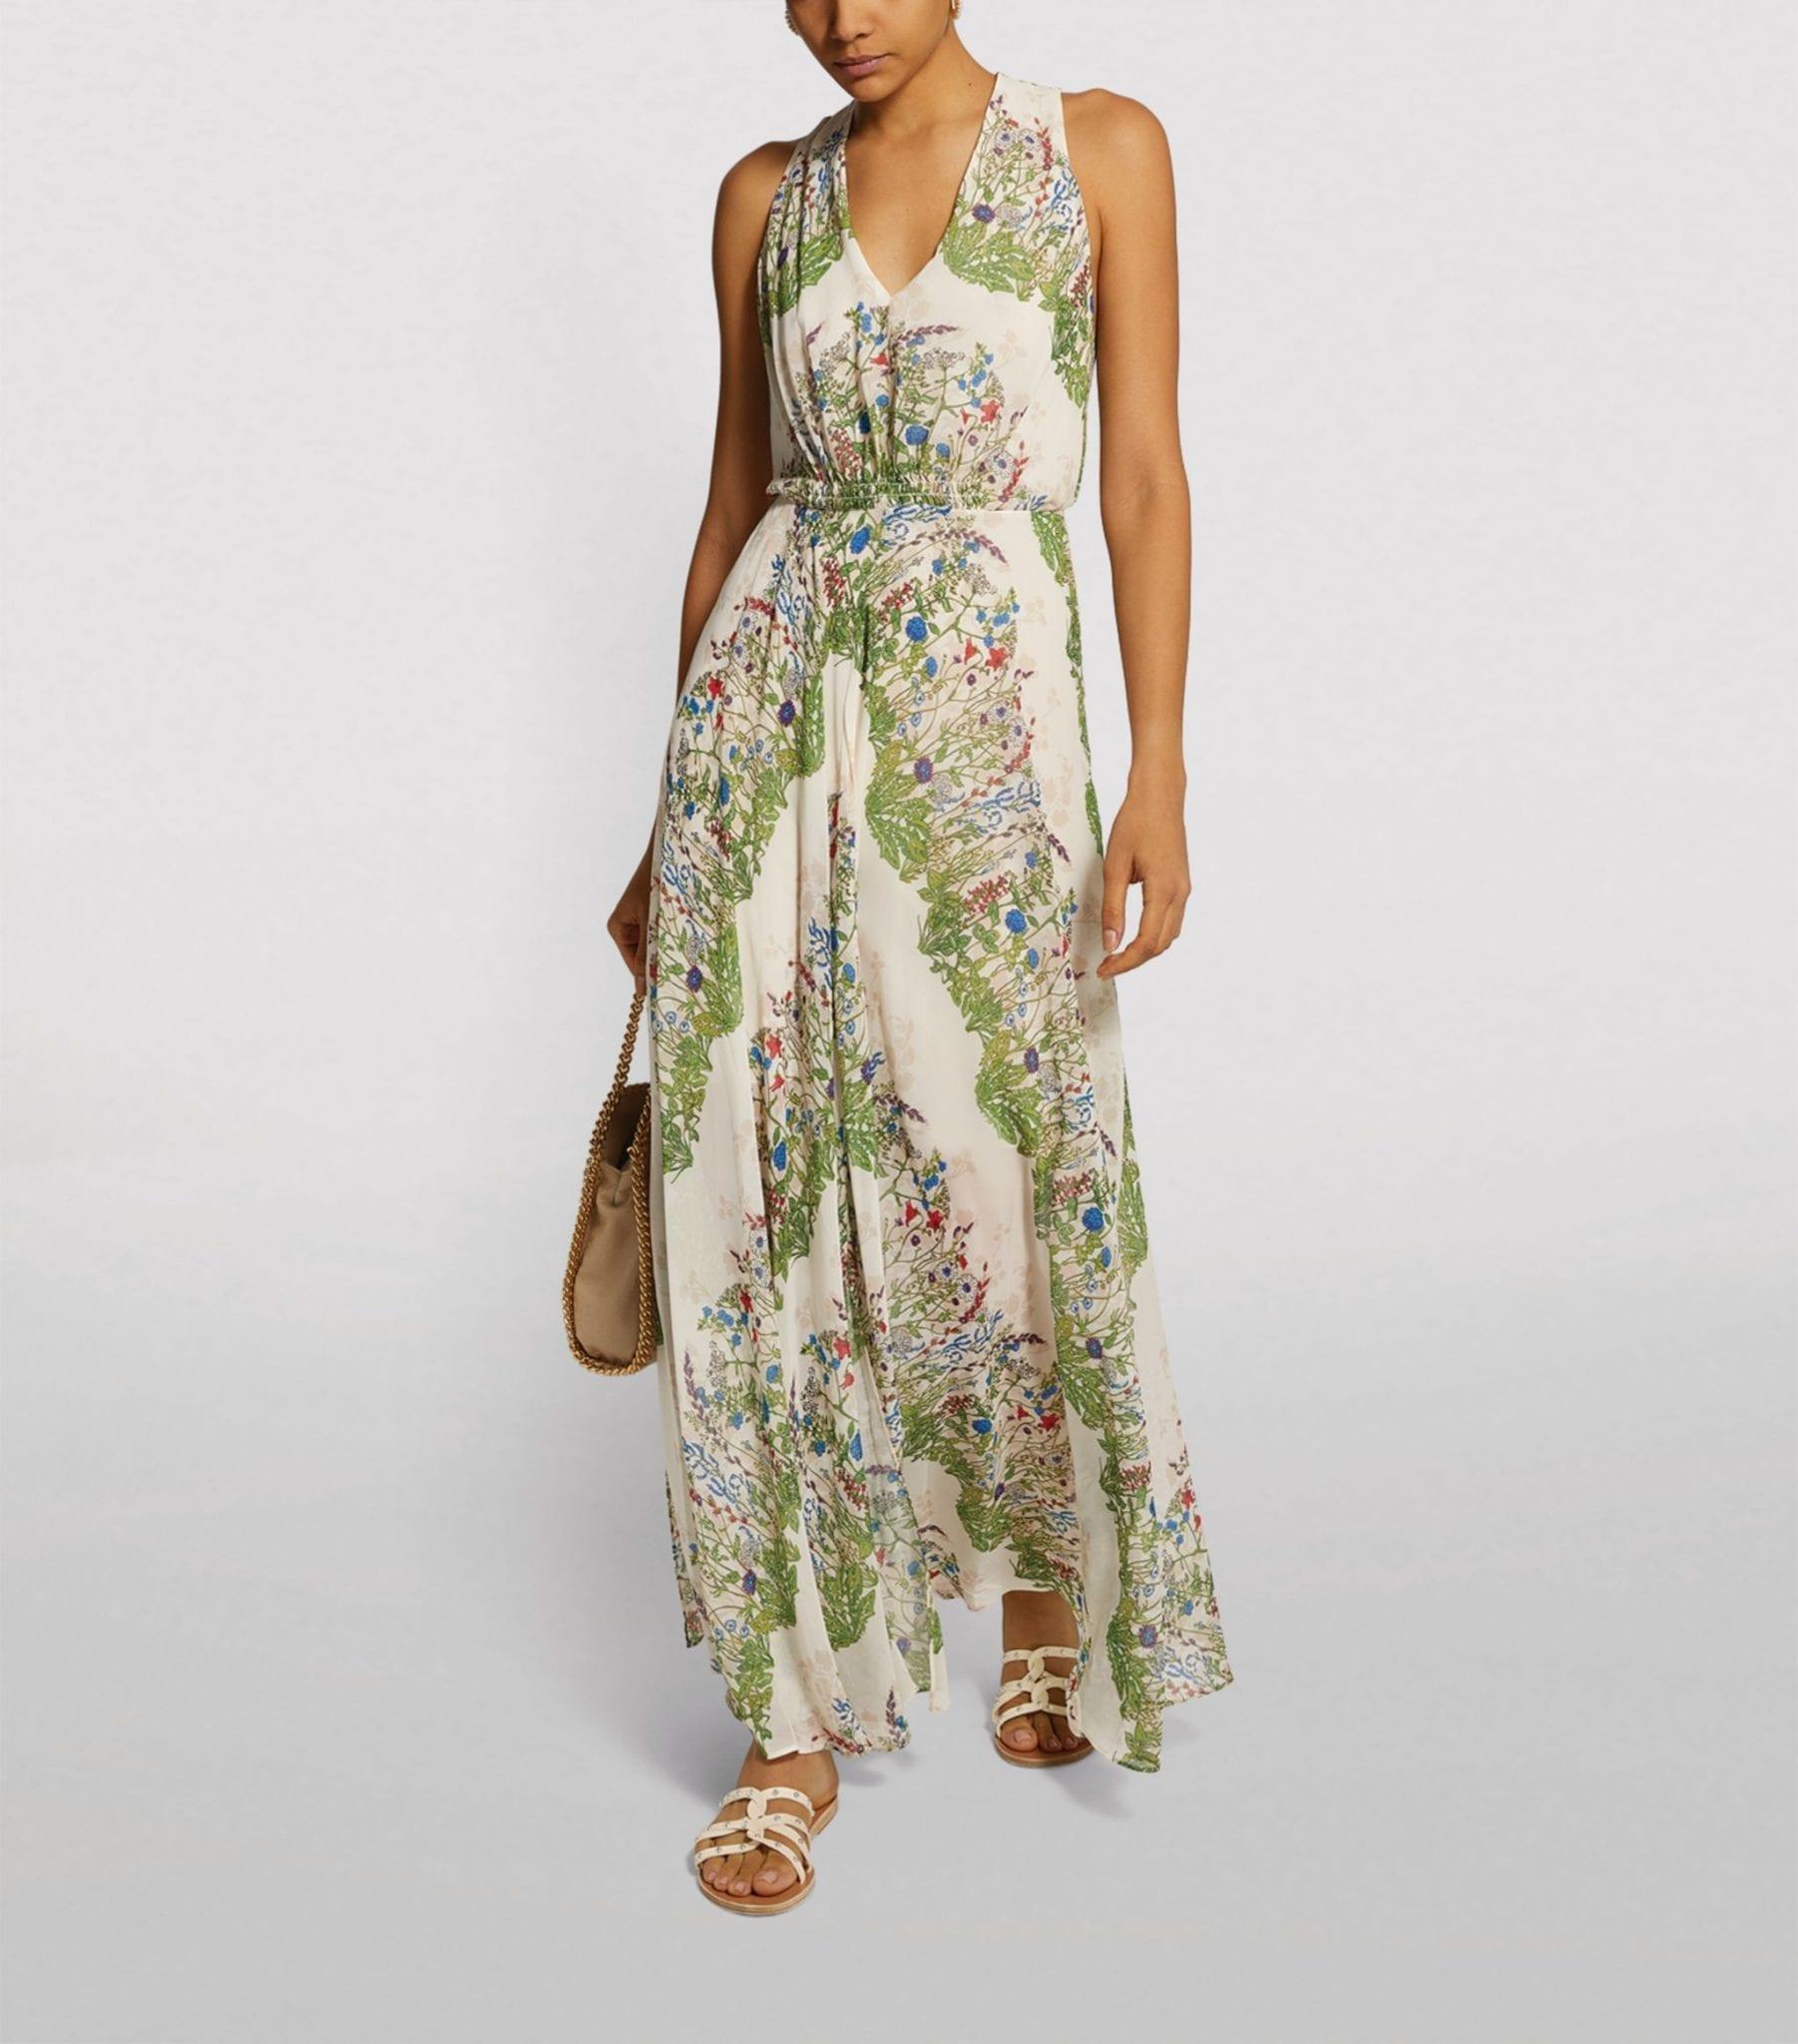 MAJE Floral Maxi Dress